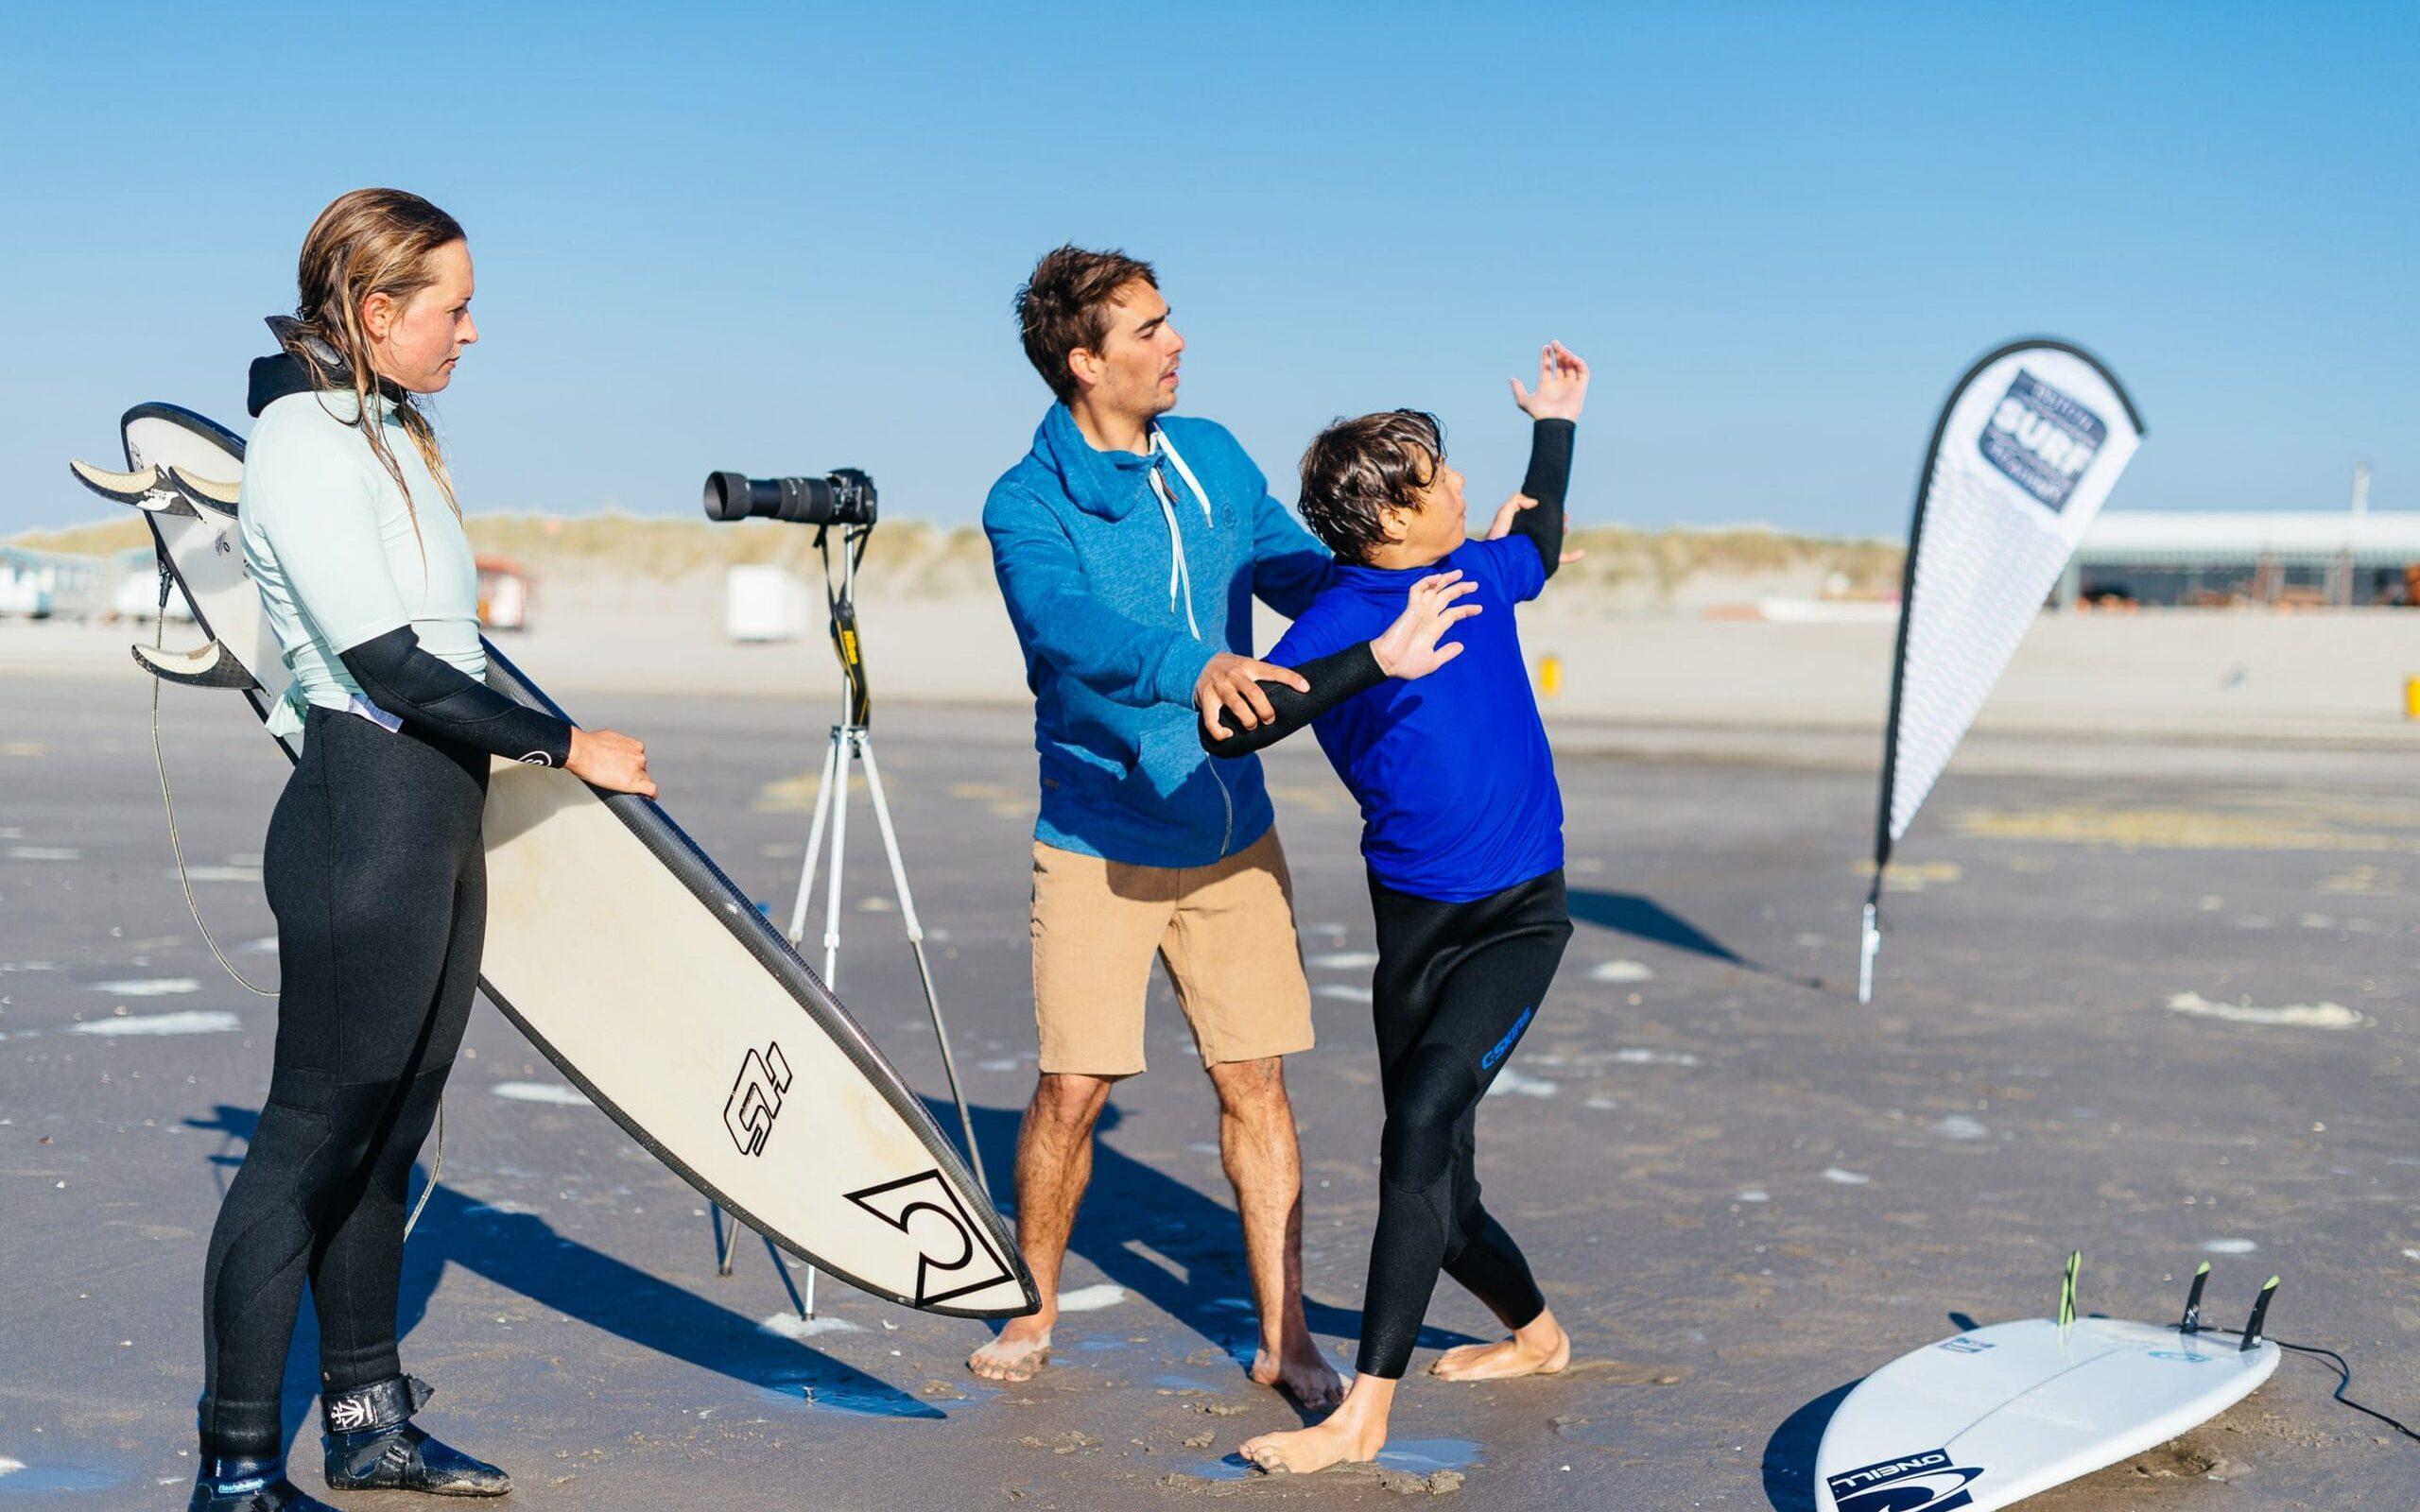 Surfschool surfcoacht intermediate surfers